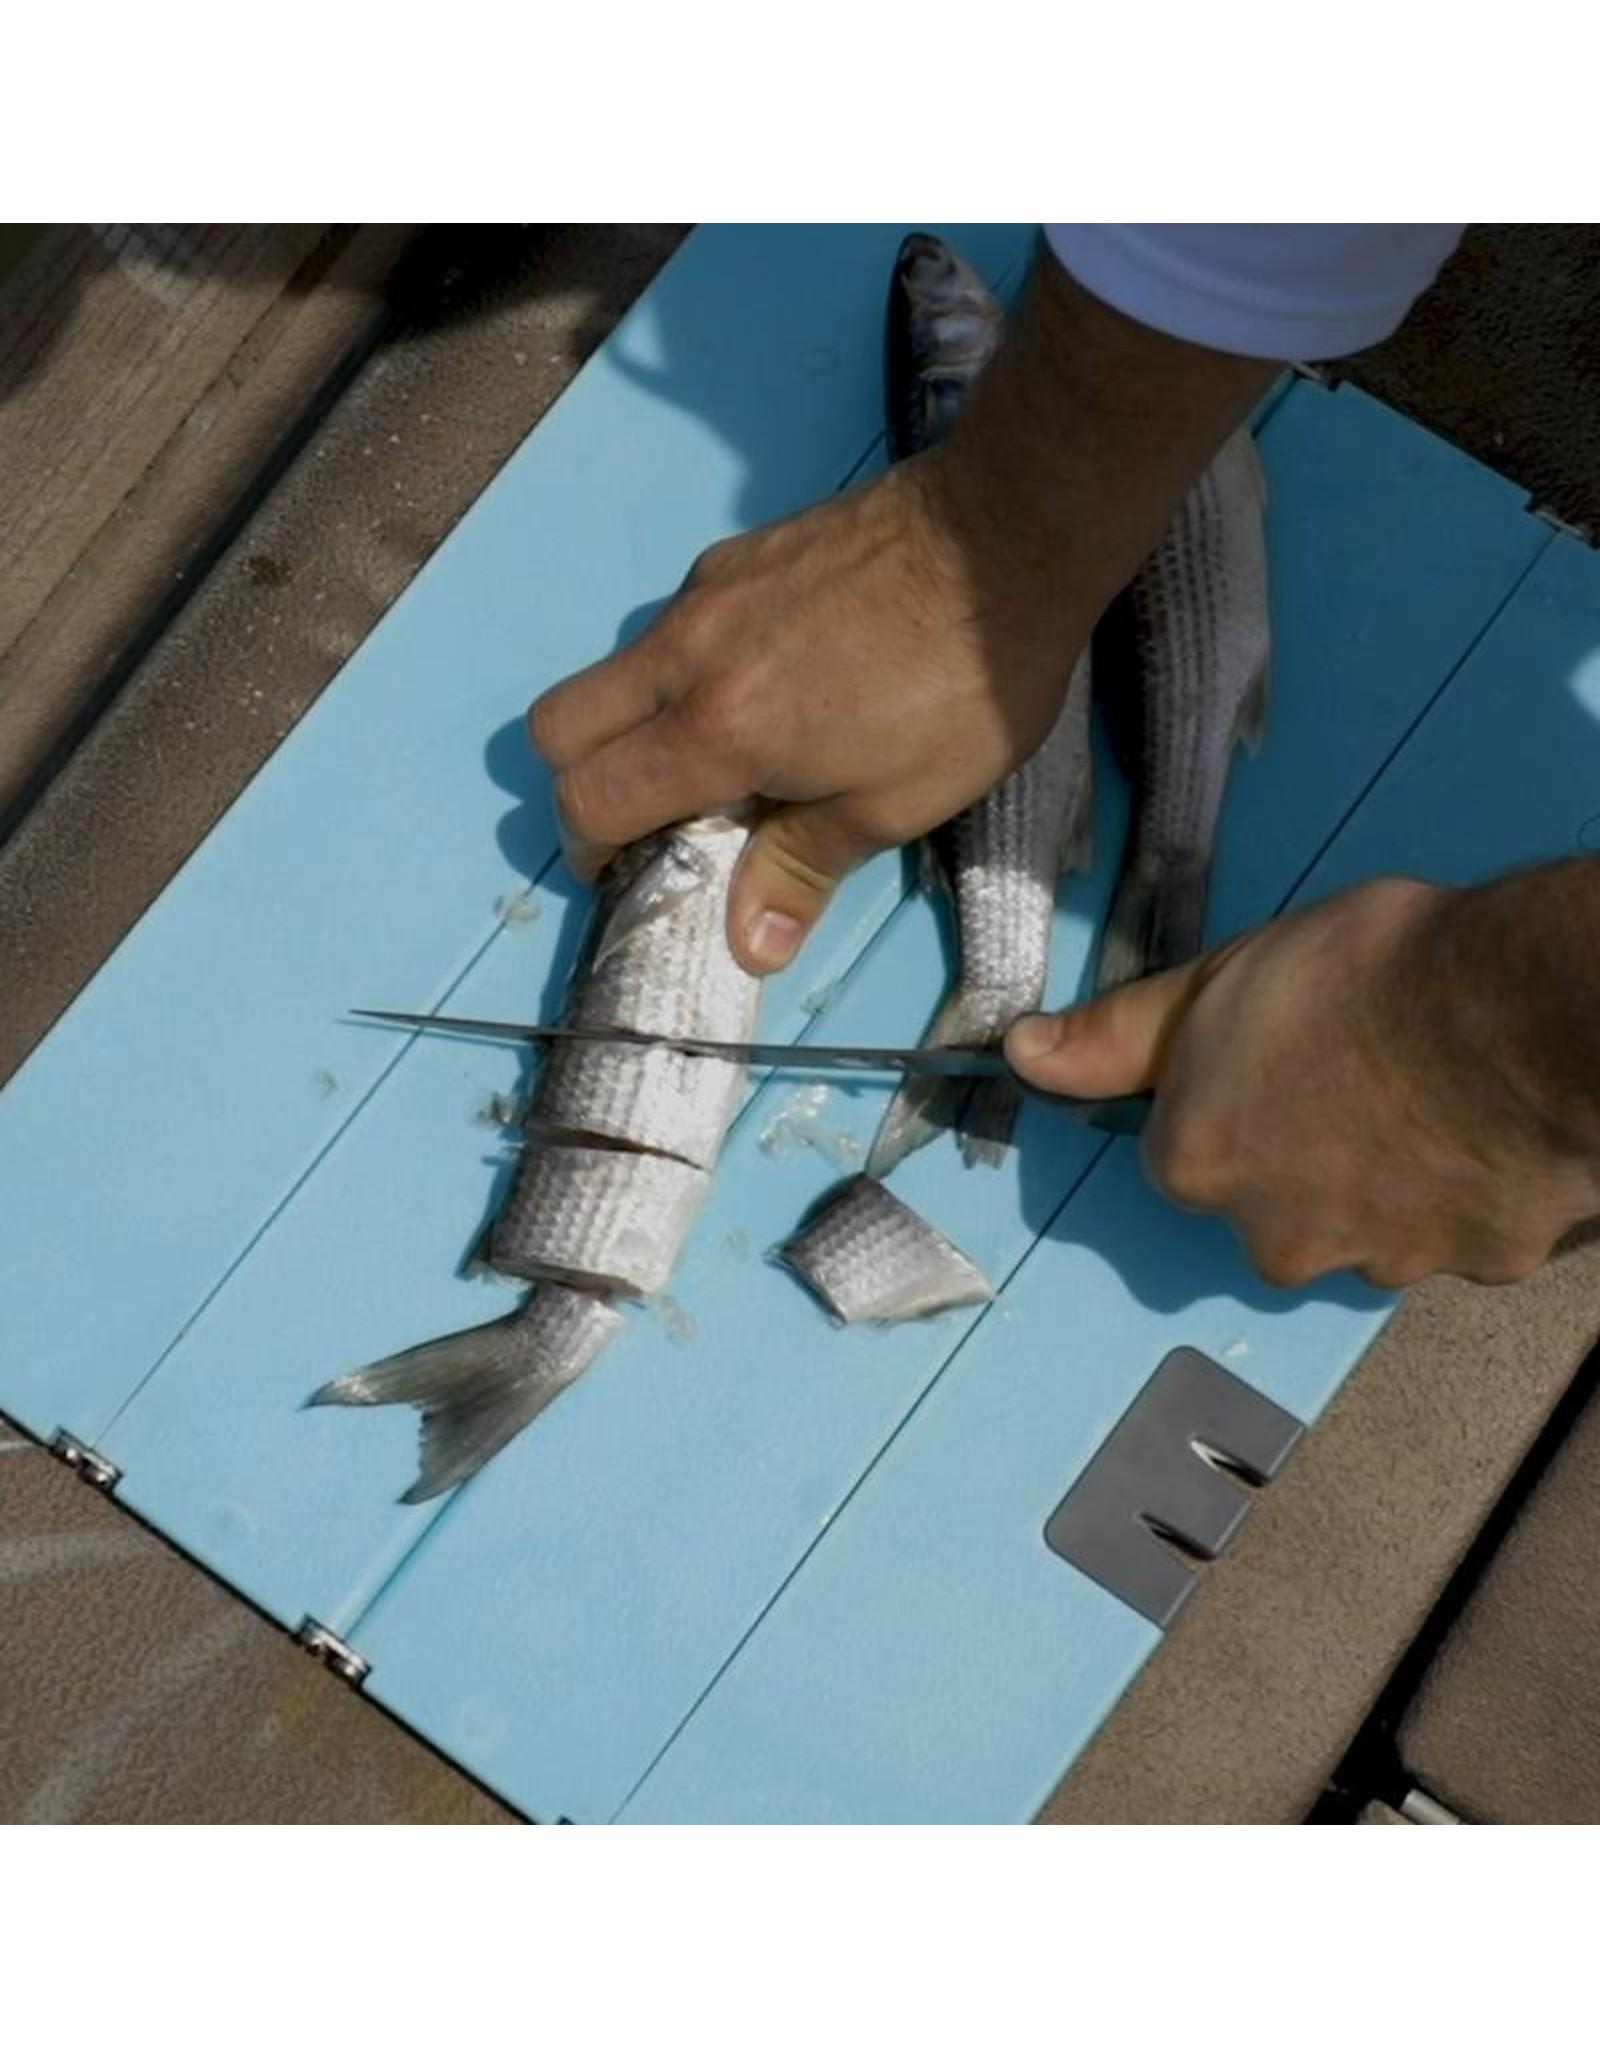 Toadfish Folding Cutting Board w/Built in Knife Sharpener - Teal